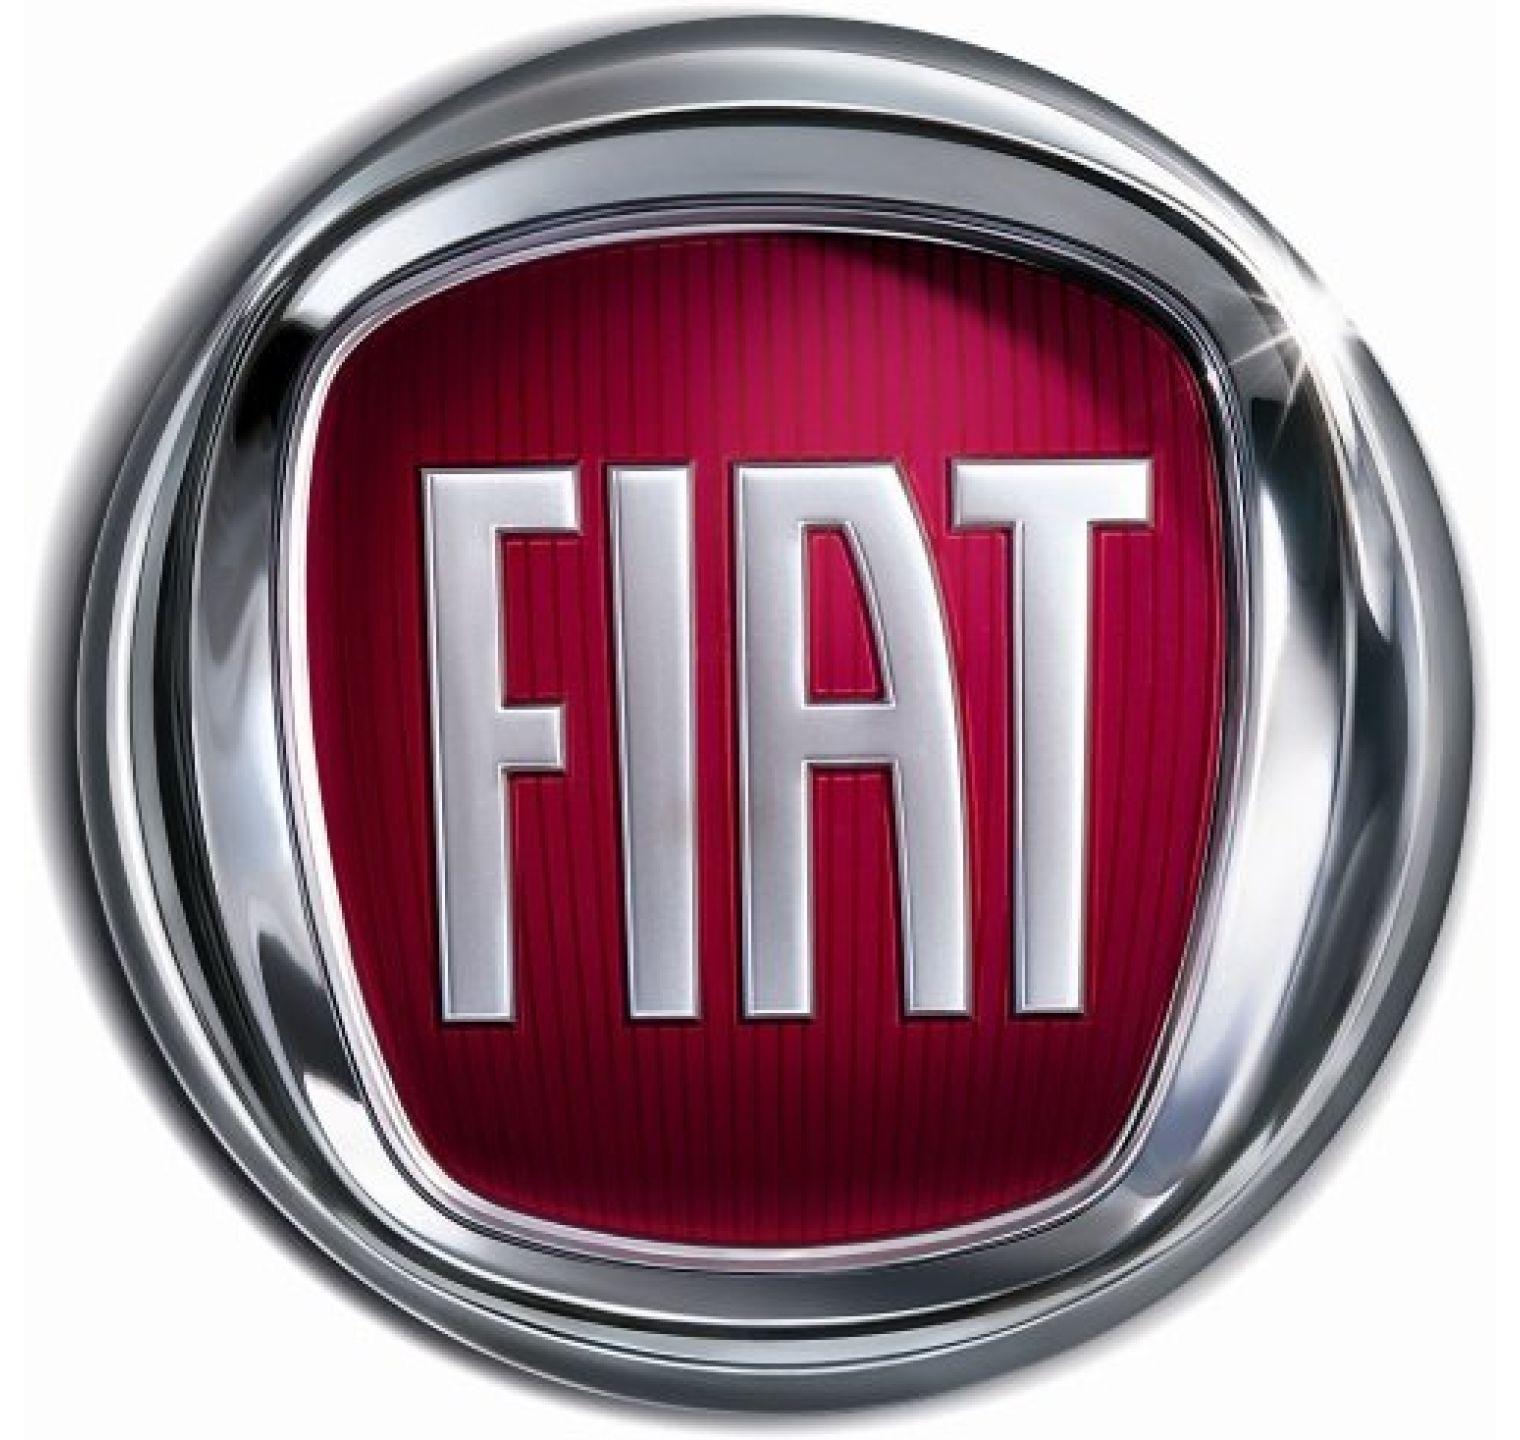 Fiat Cinquecento (1991 t/m 1999) - set ruitenwissers Valeo Compact Revolution